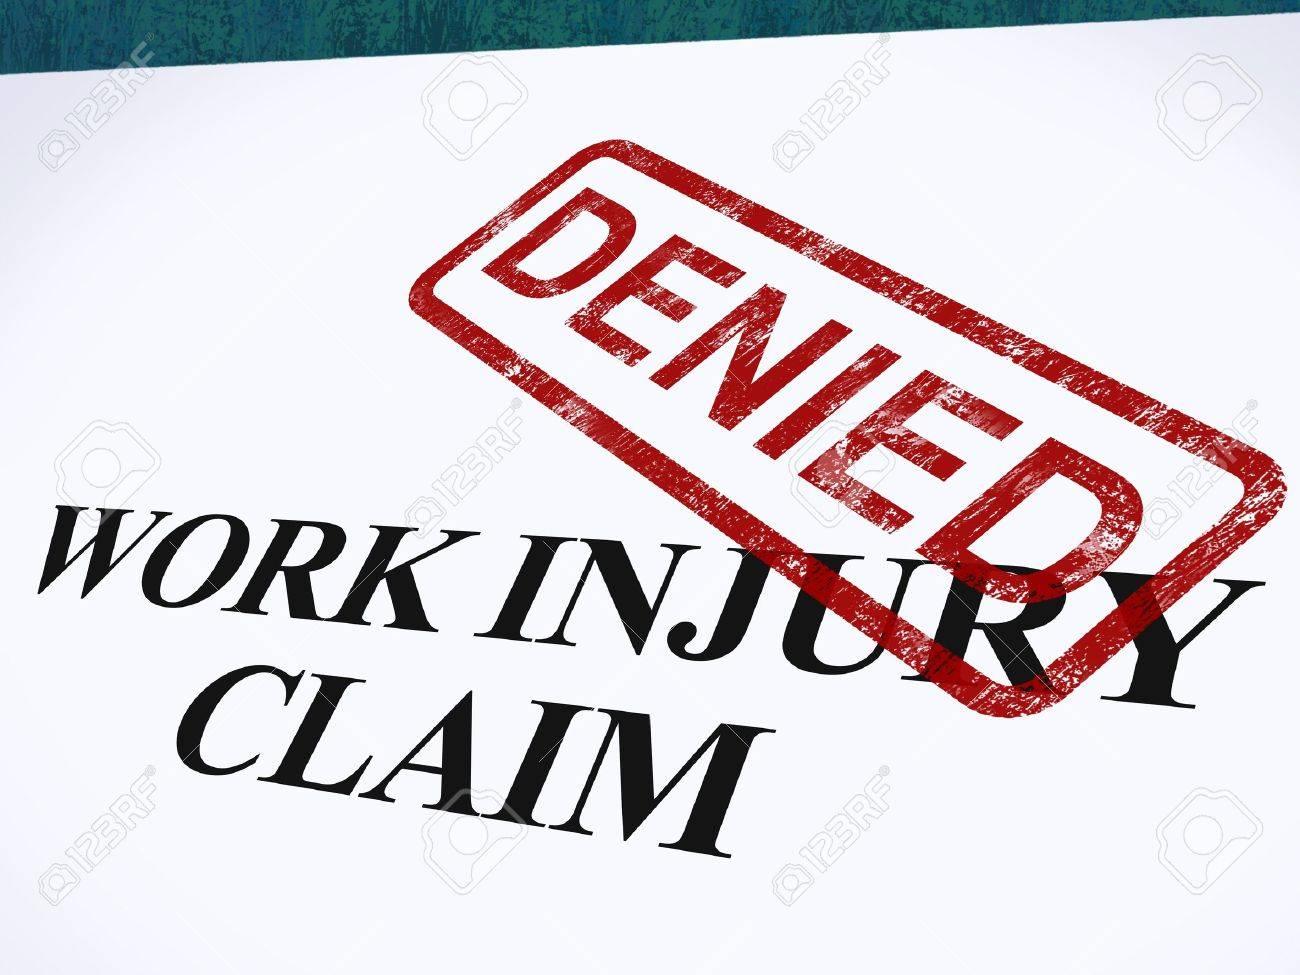 Work Injury Claim Denied Showing Medical Expenses Refused Stock Photo - 14055036